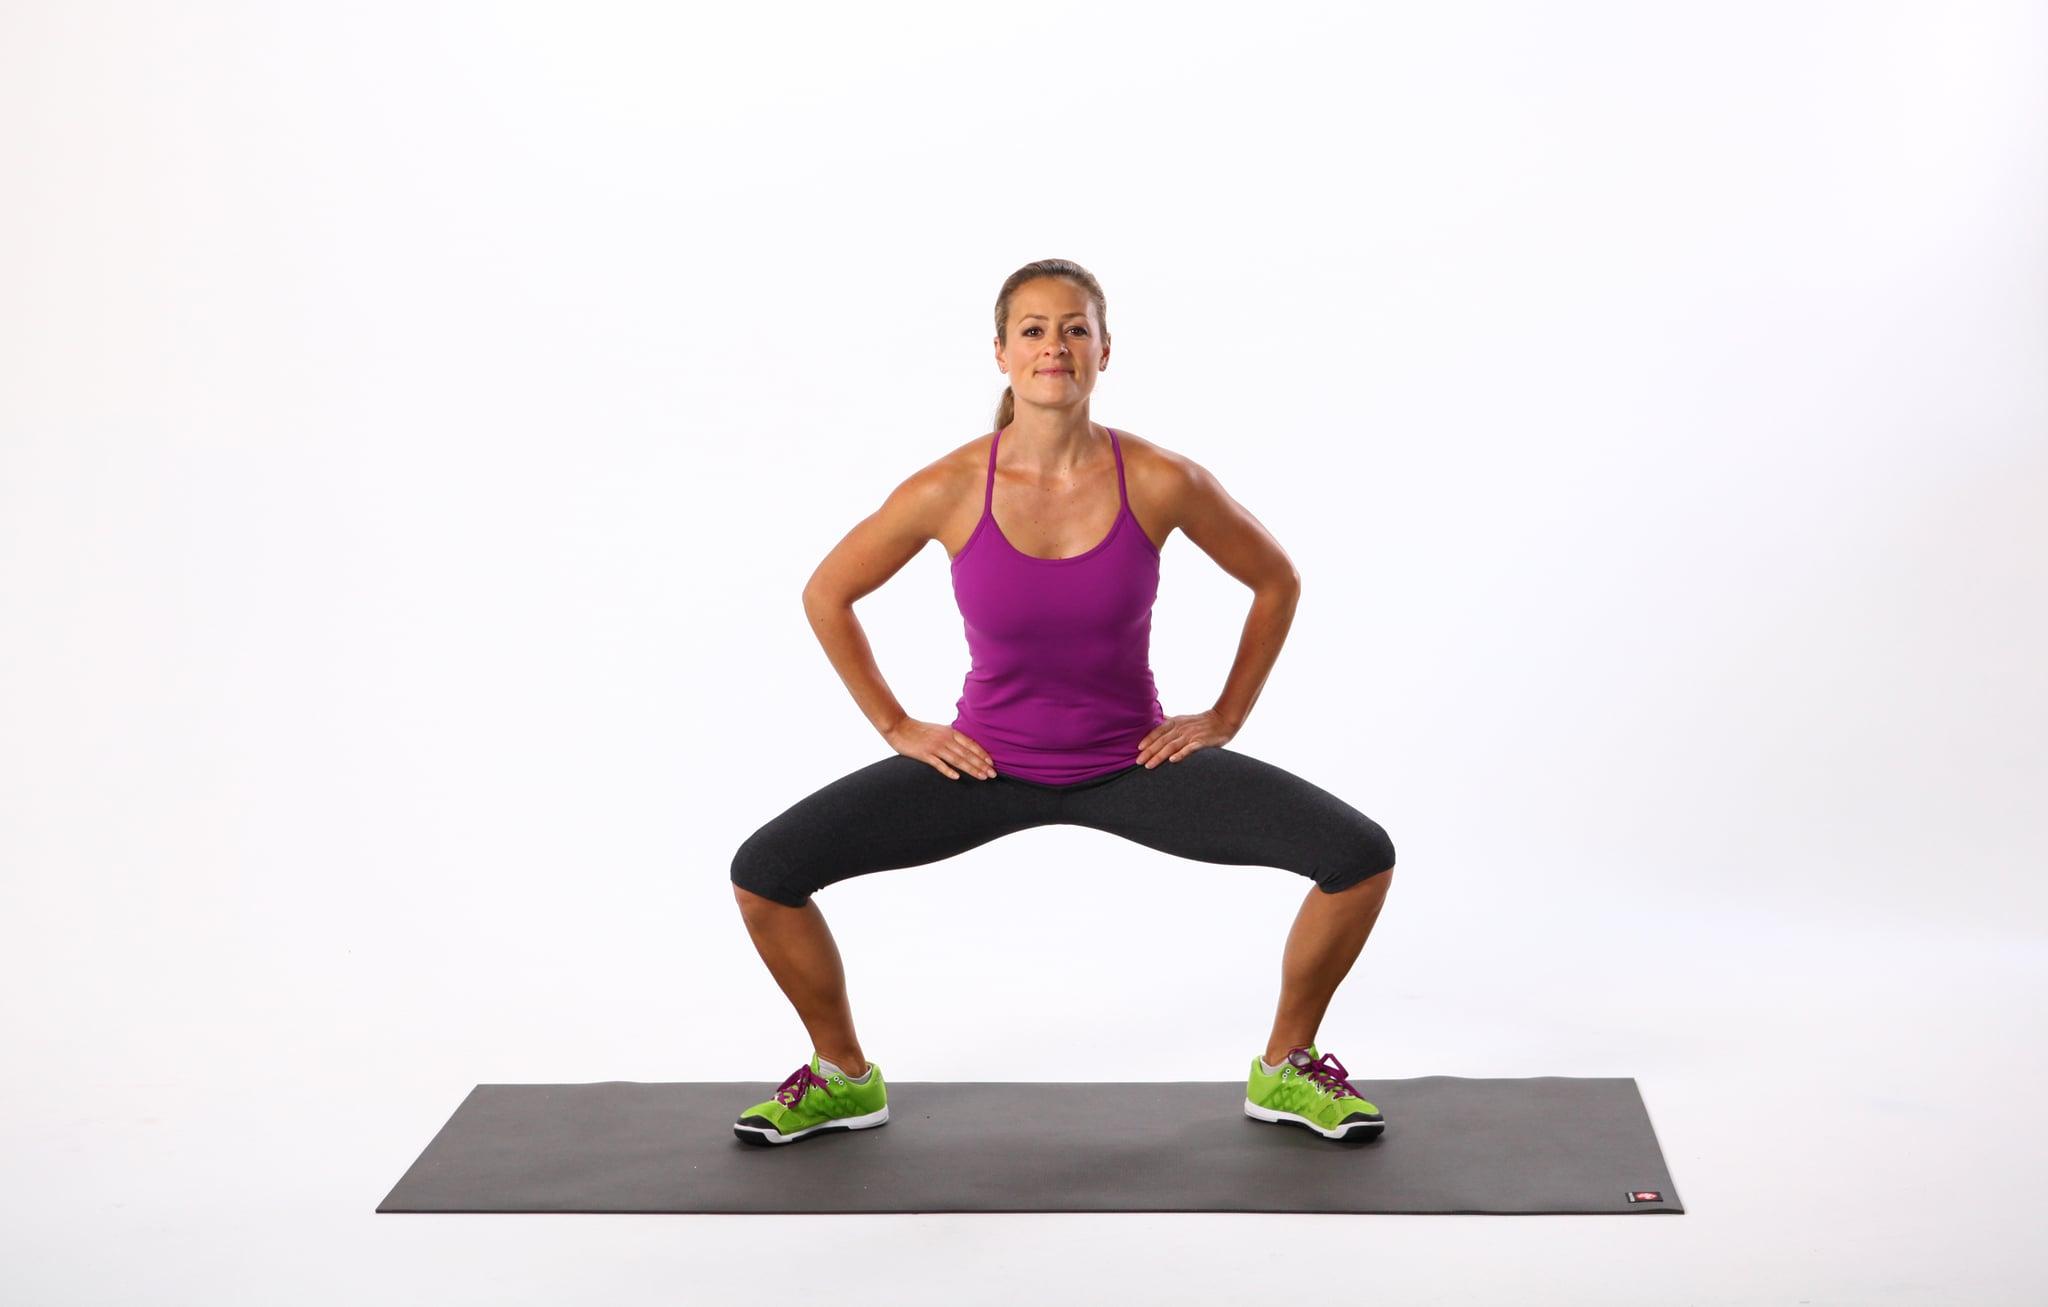 Calorie-Blasting Workout